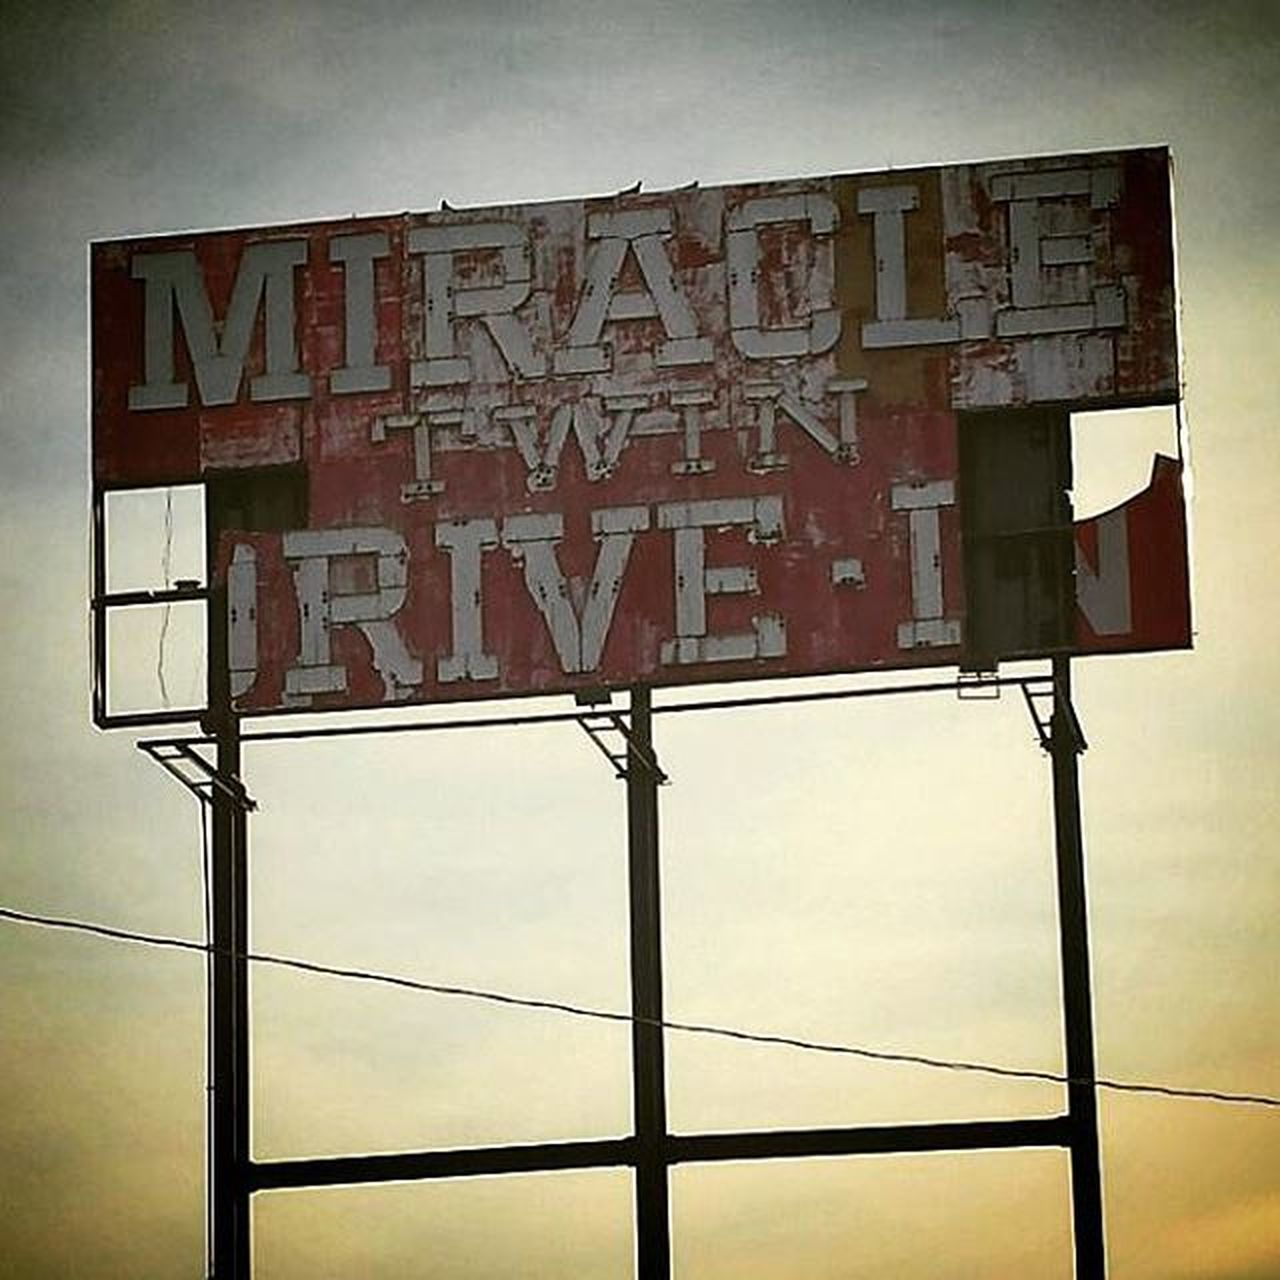 Miracletwin Drivein Driveinmovie Flint Dontdrinkthewater Puremichigan Wewereyounghere Urbanlife Billboard Michigan Rustic Sign Cinema In Your Life